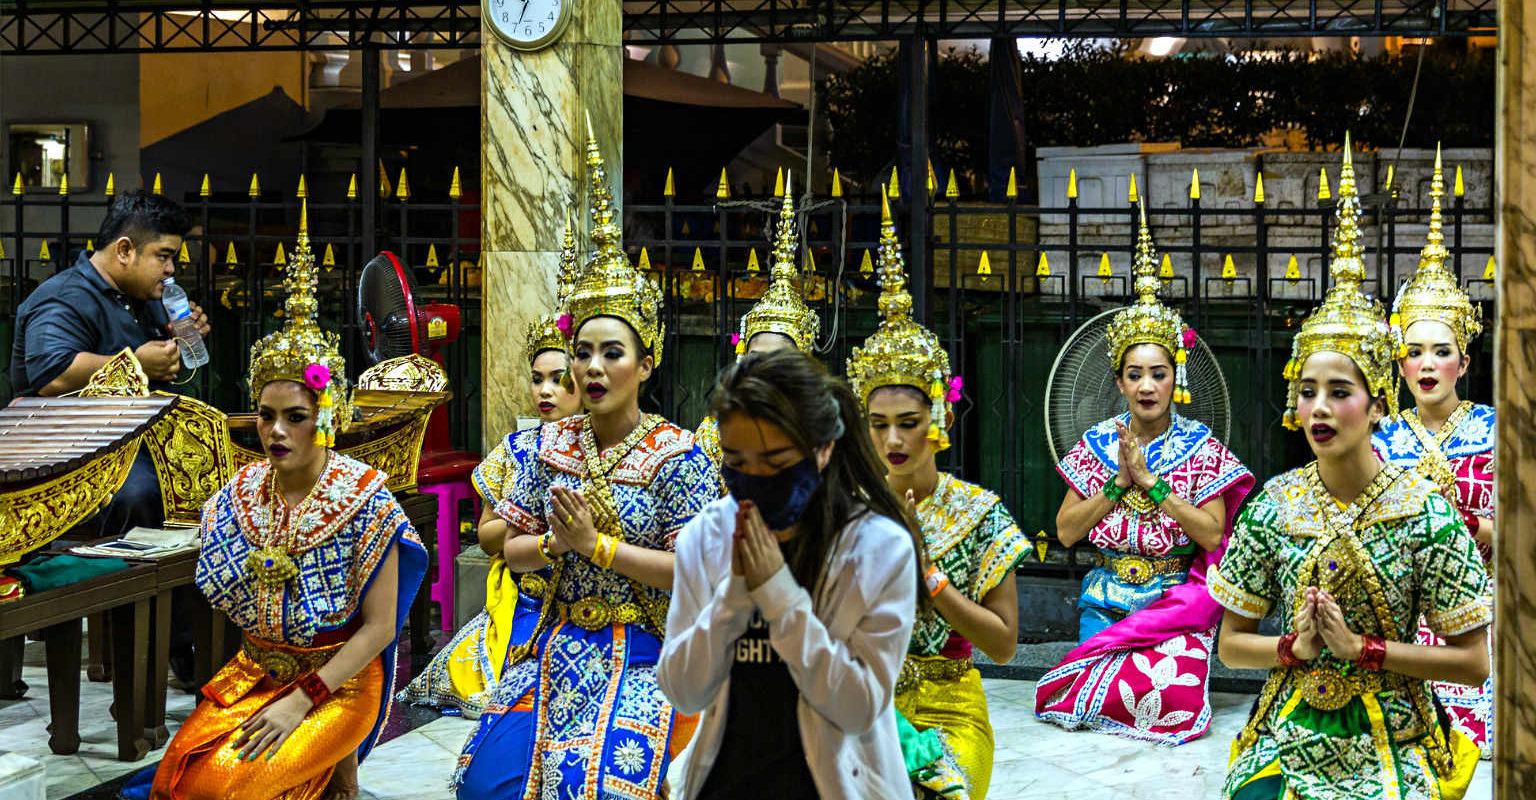 Siam Square, centrum Bangkok, danseressen bij de Erawan Shrine Tempel in Bangkok